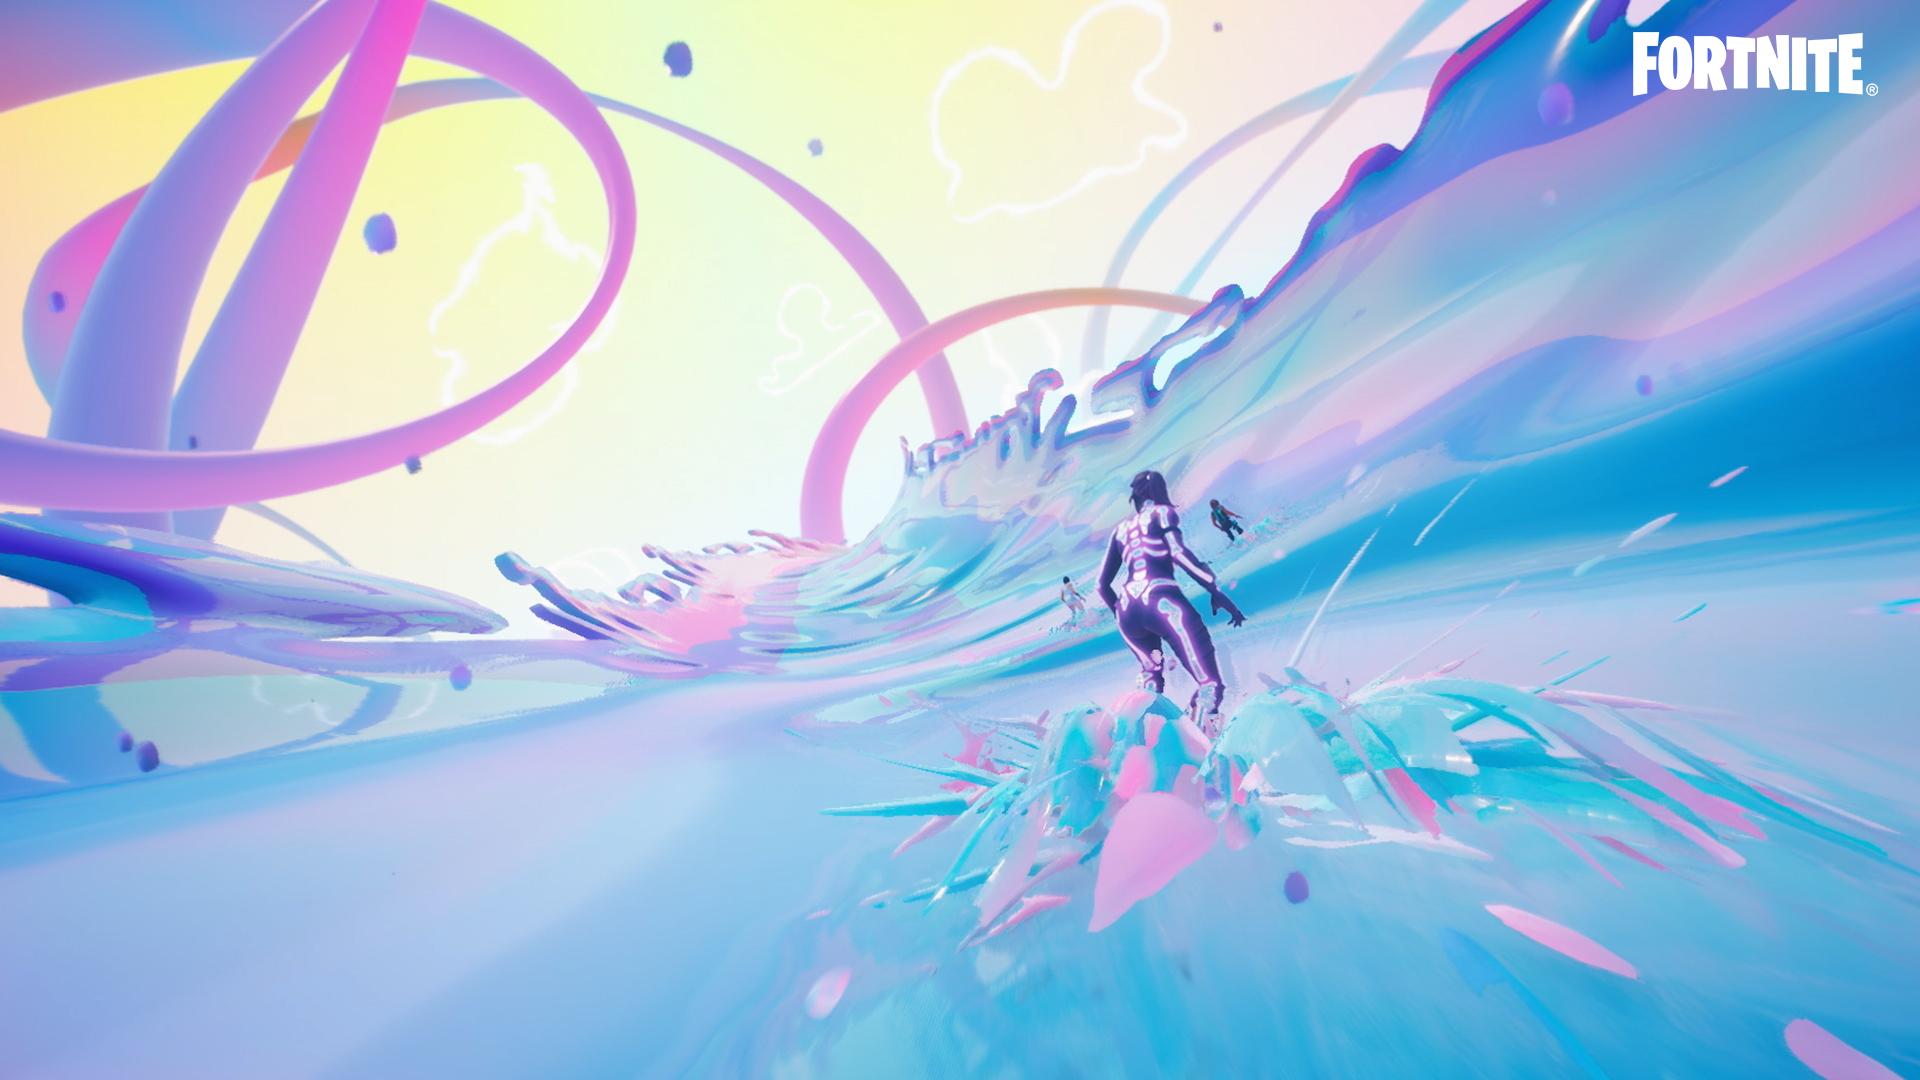 ariana grande fortnite surf